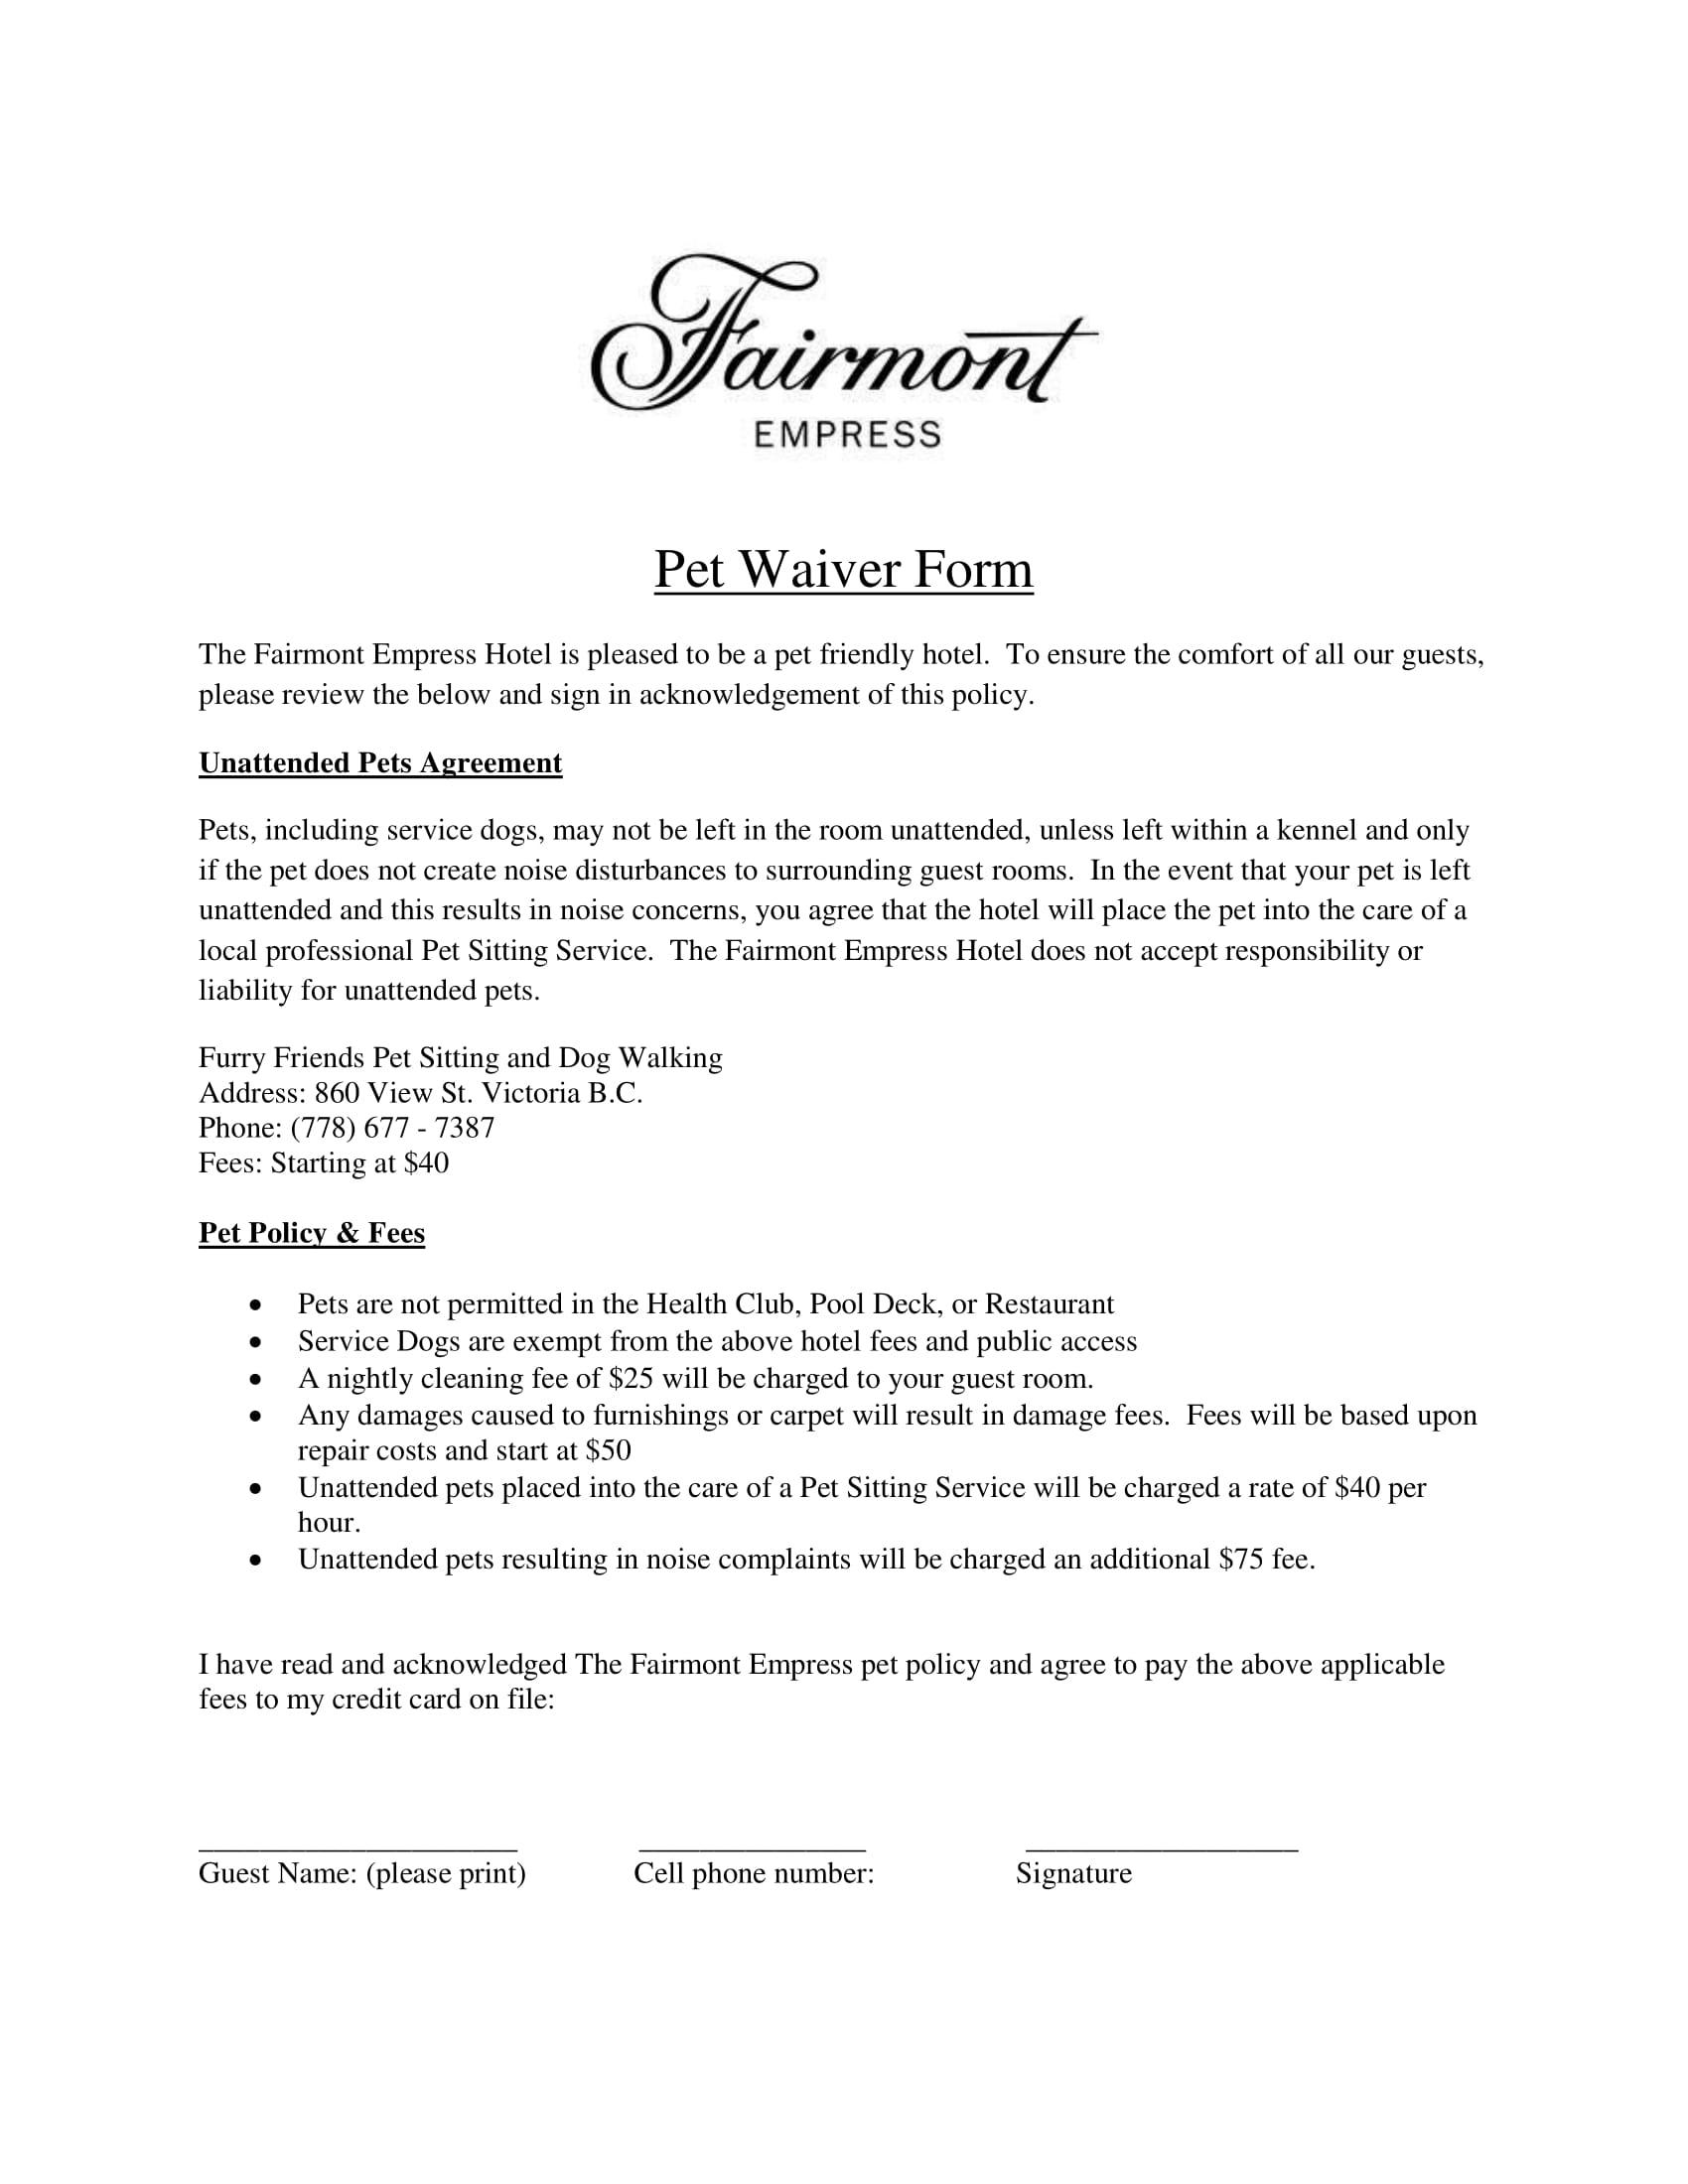 hotel restaurant pet waiver form 1